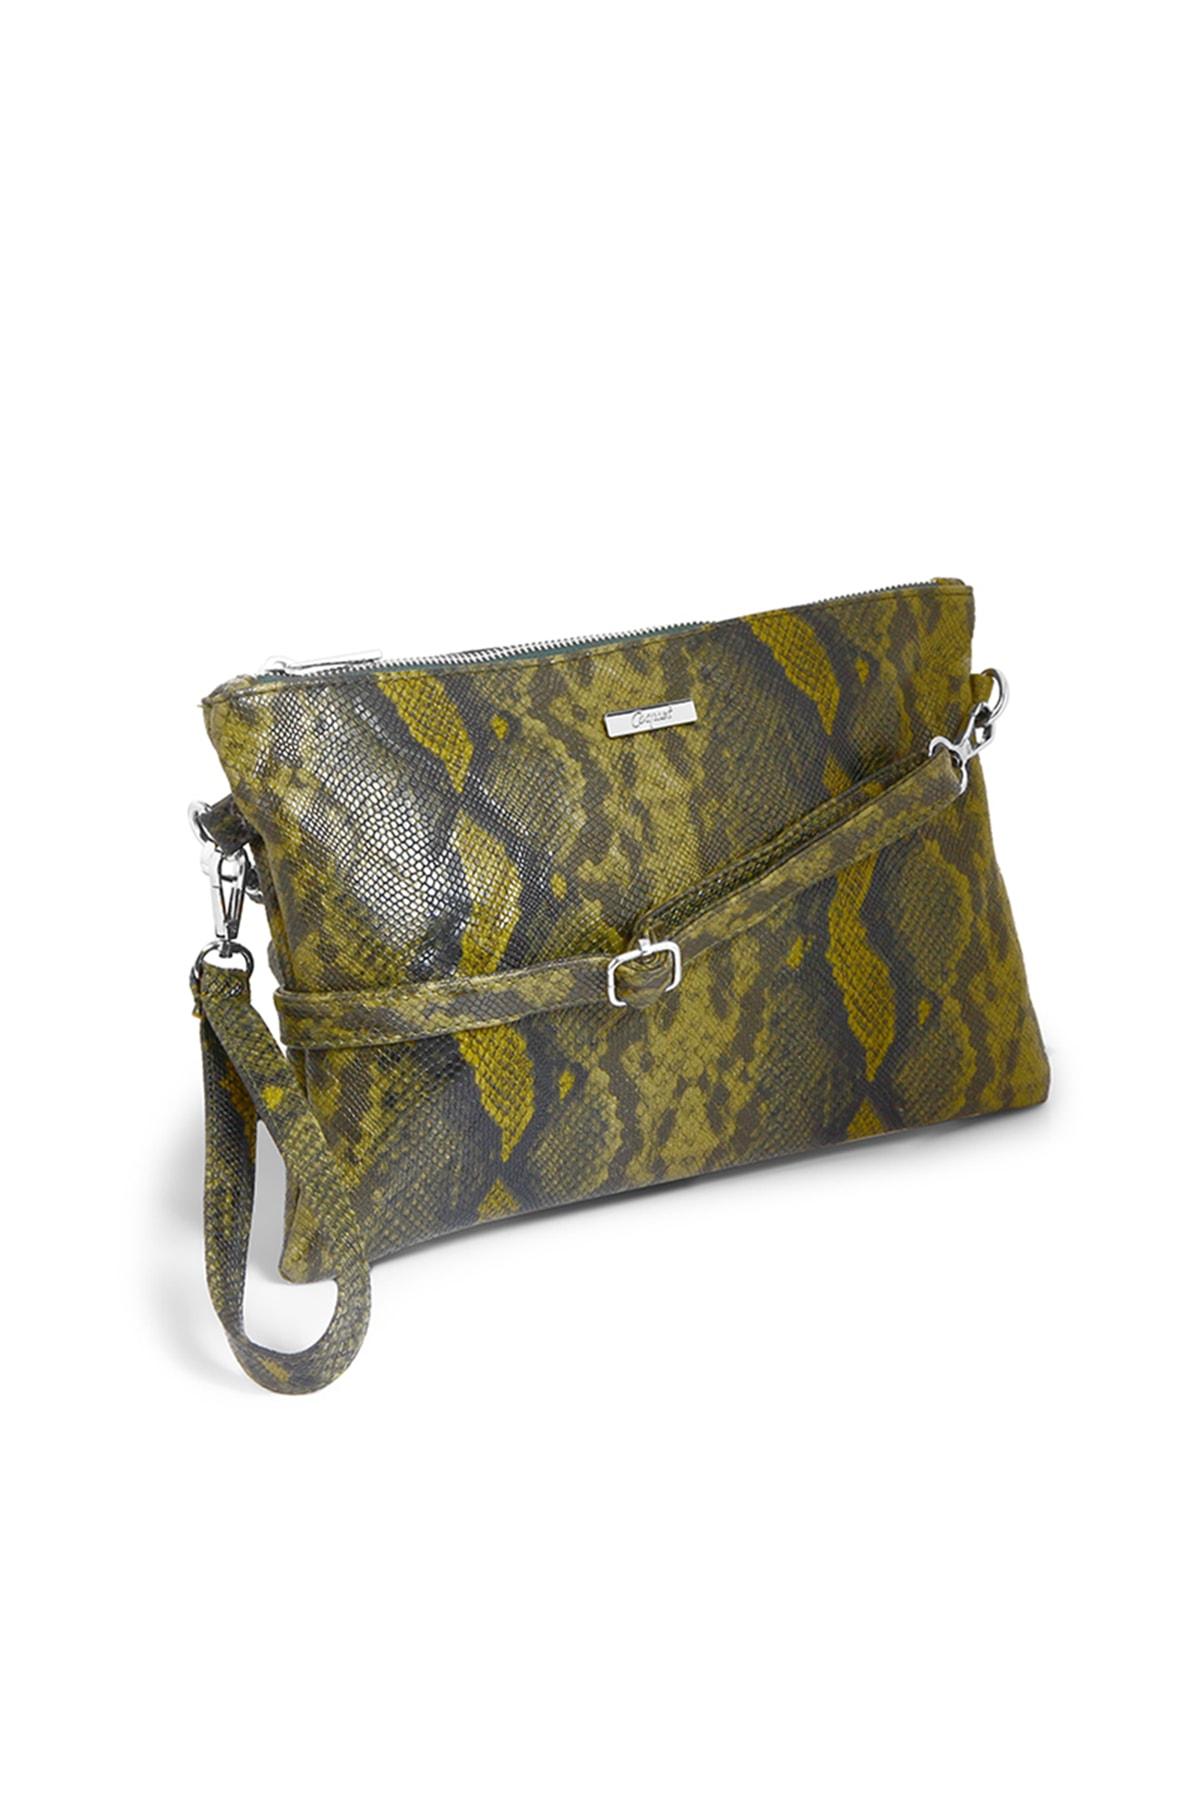 Coquet Accessories Kadın Yeşil Karite Clutch 19G3U13N078 2